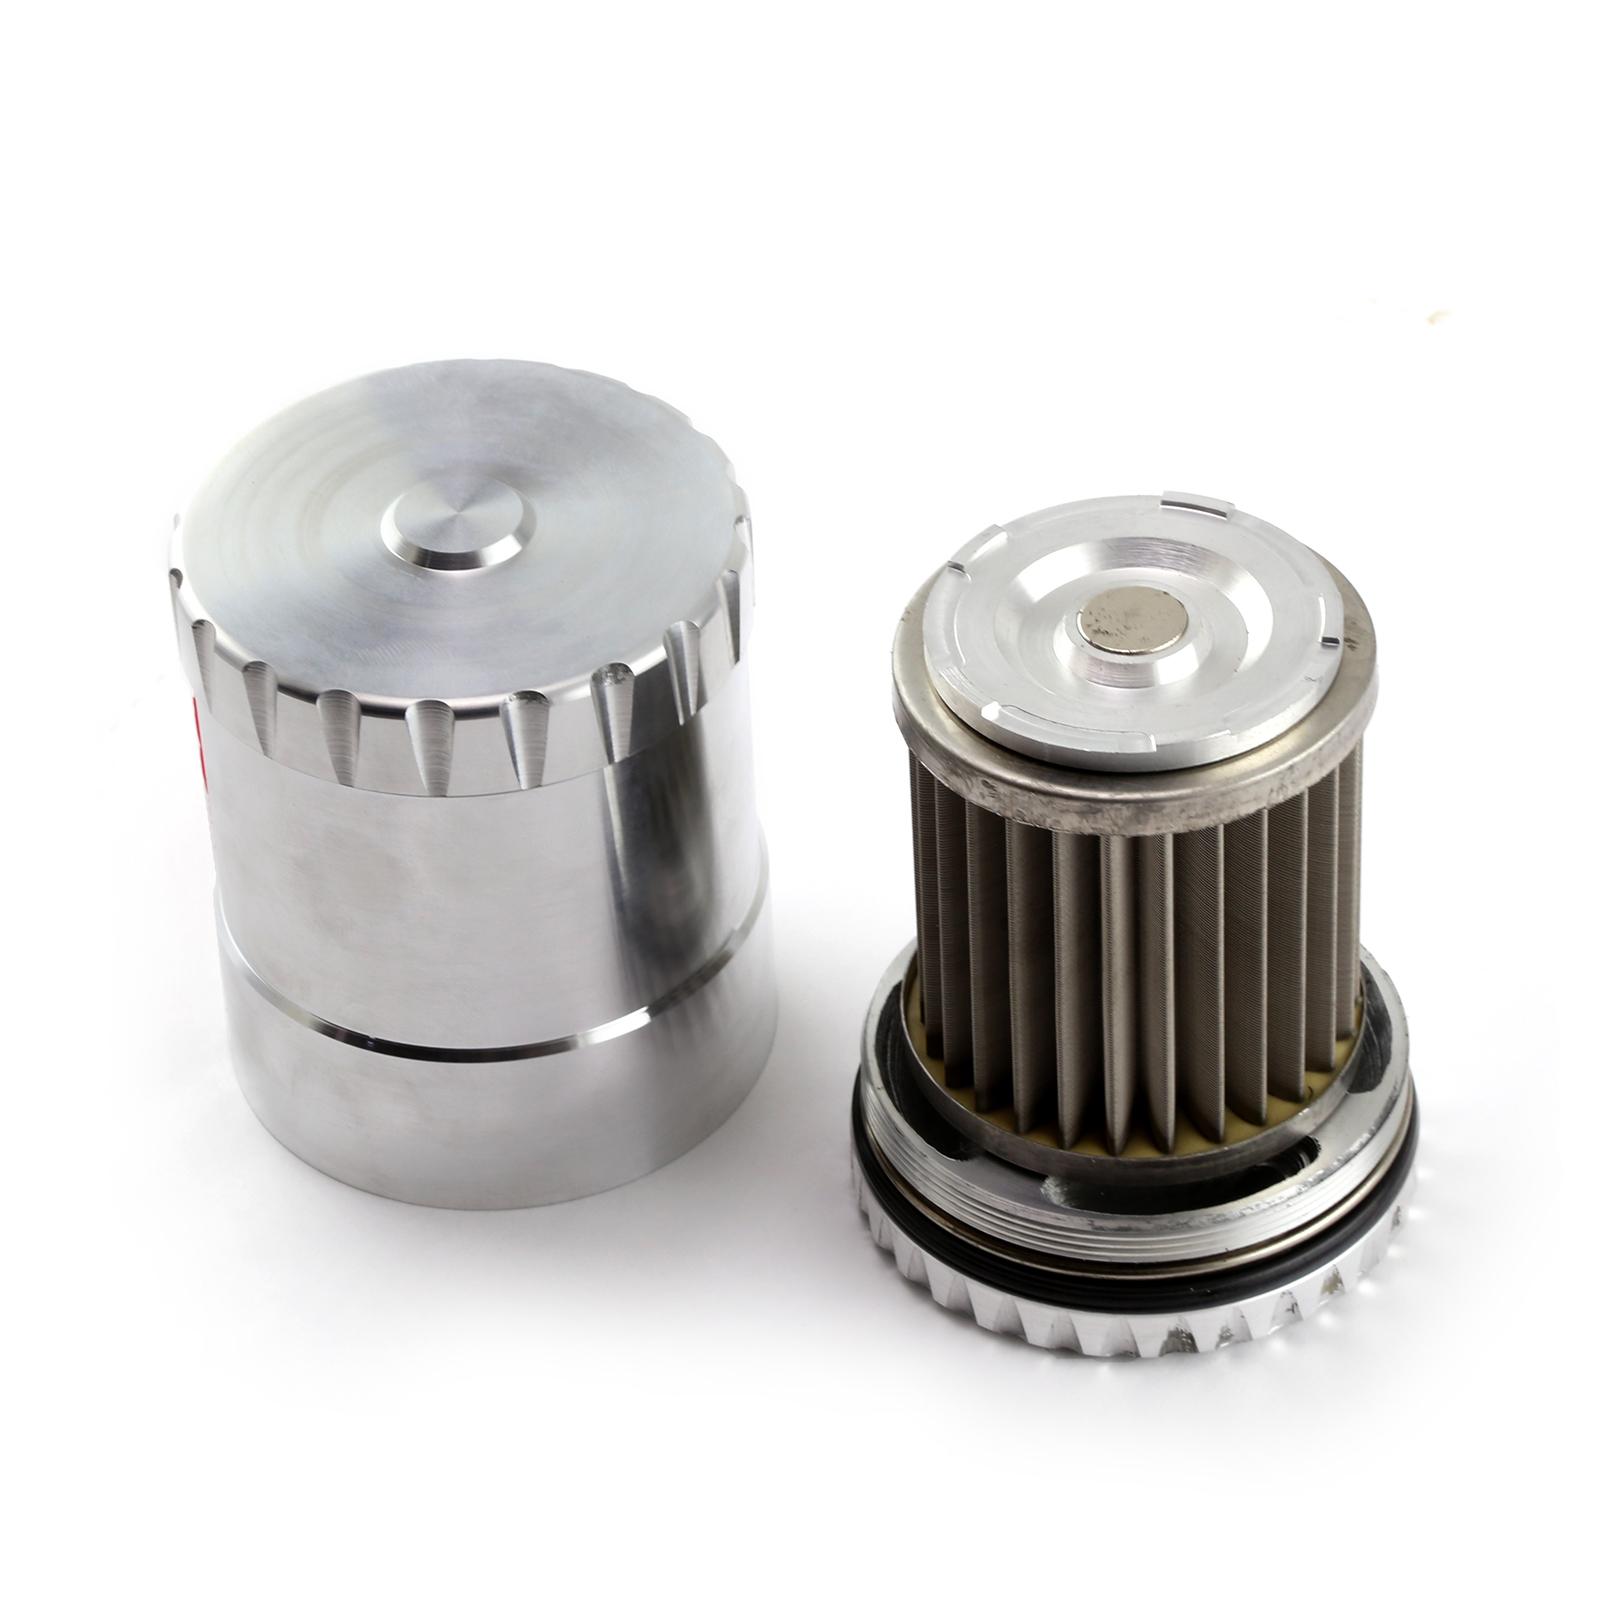 Ford Billet Aluminum Reusable Oil Filter w/Stainless Steel Element & Magnet